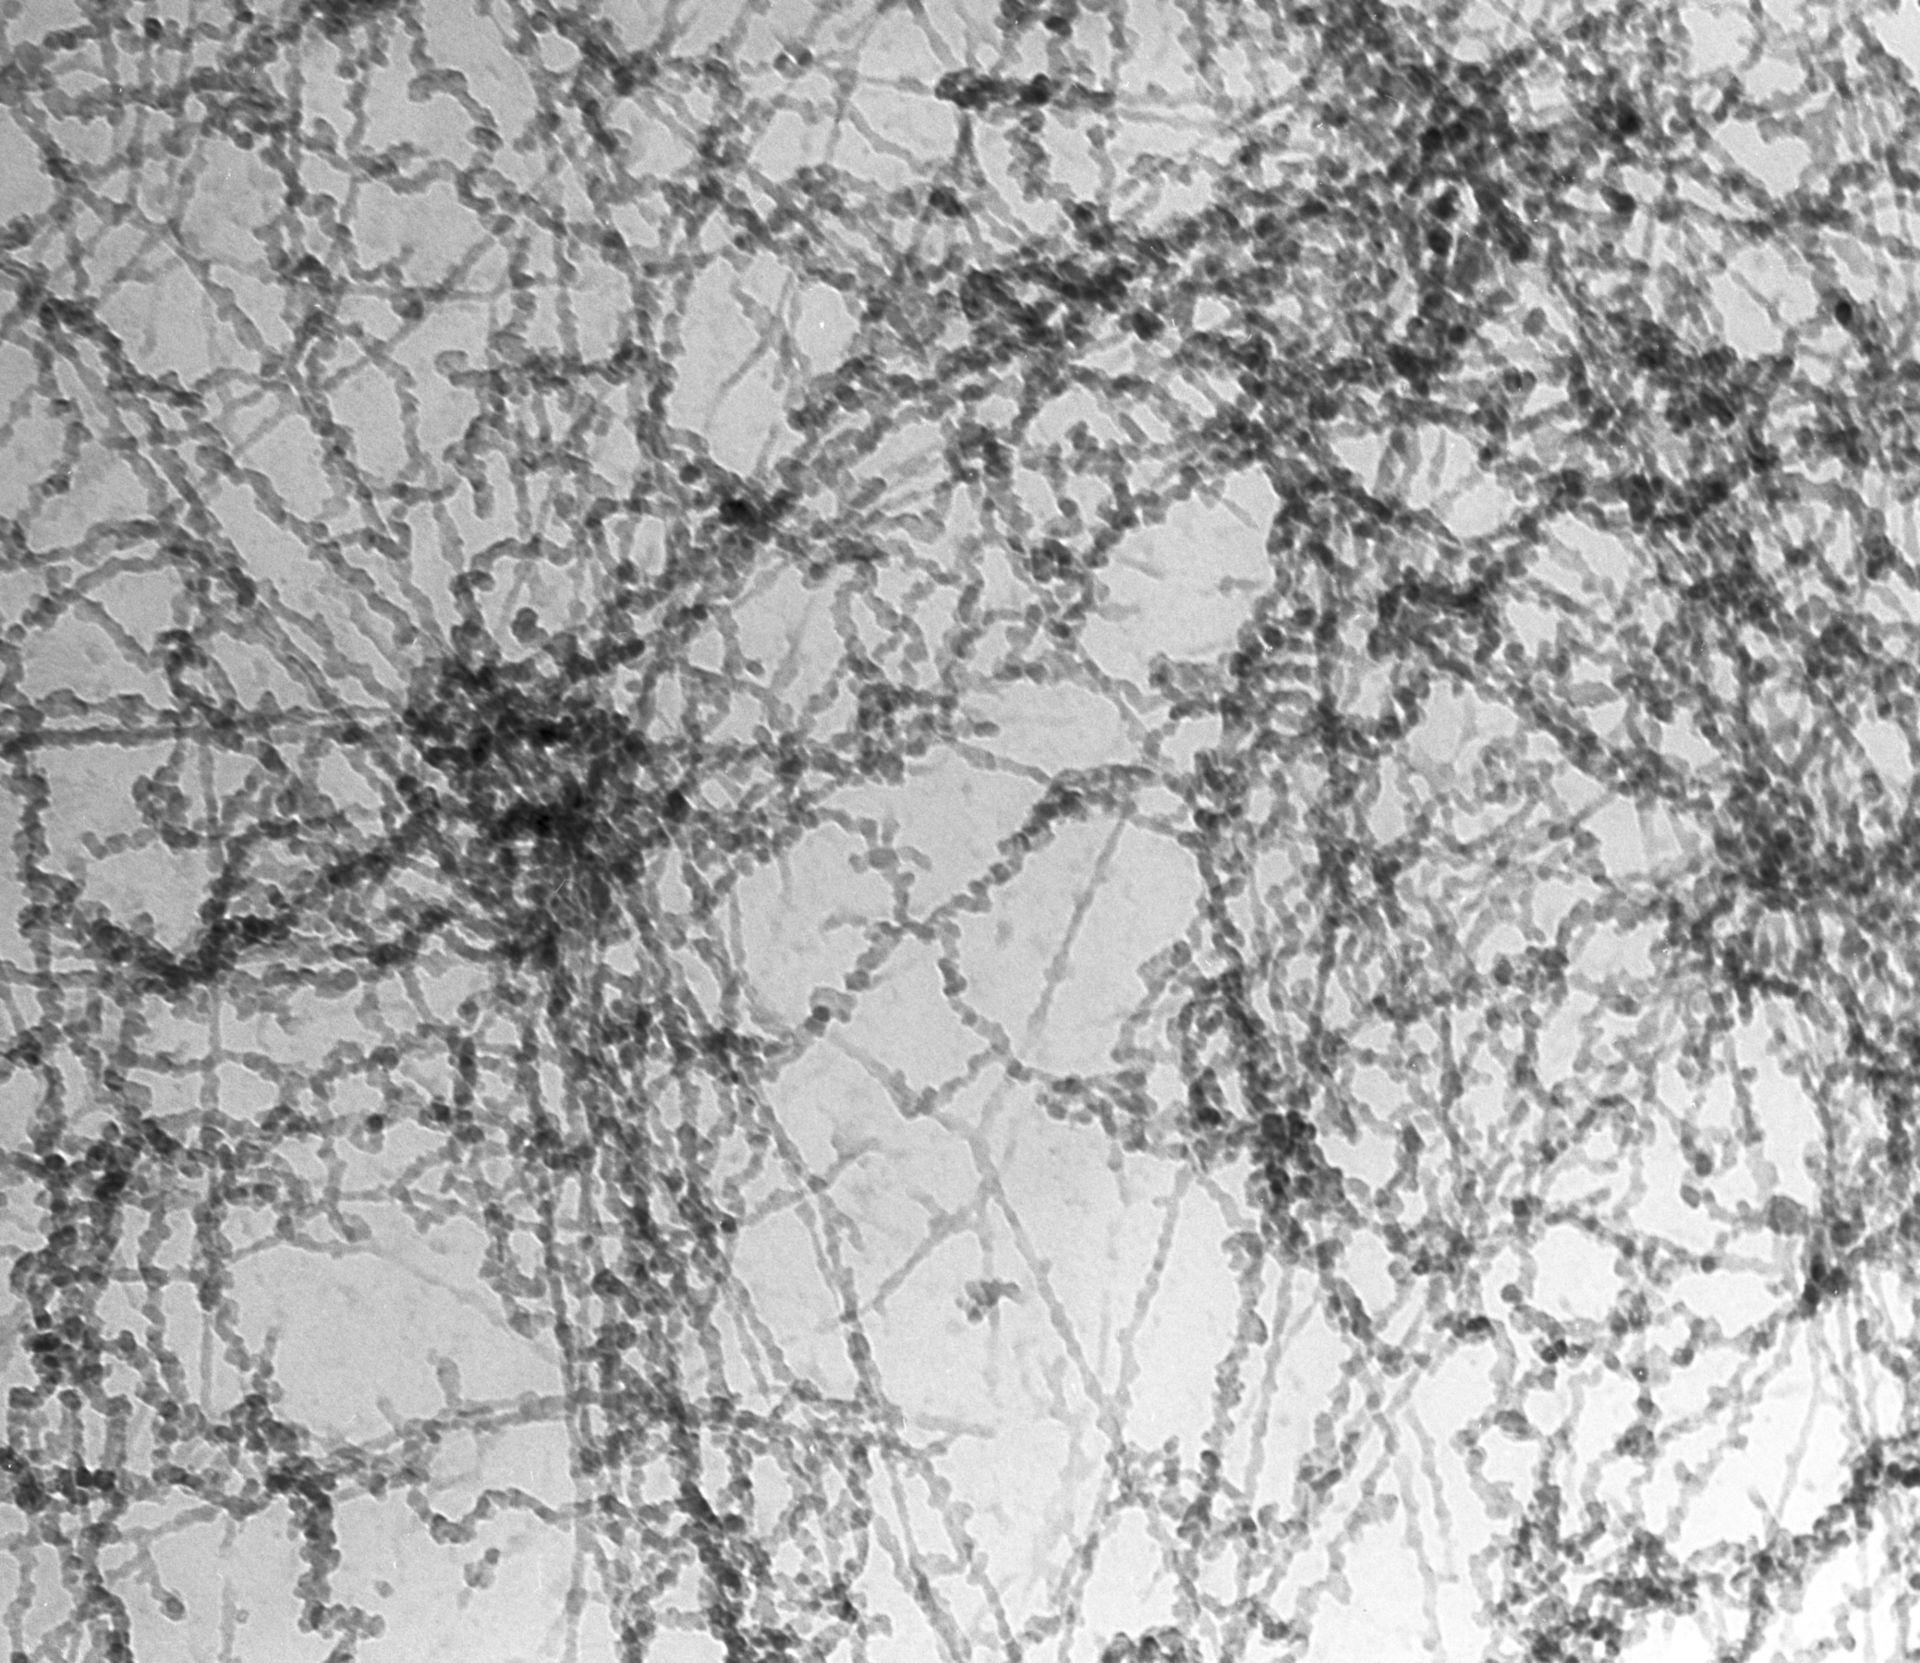 Notopthalmus viridescence (Nuclear chromatin) - CIL:10086